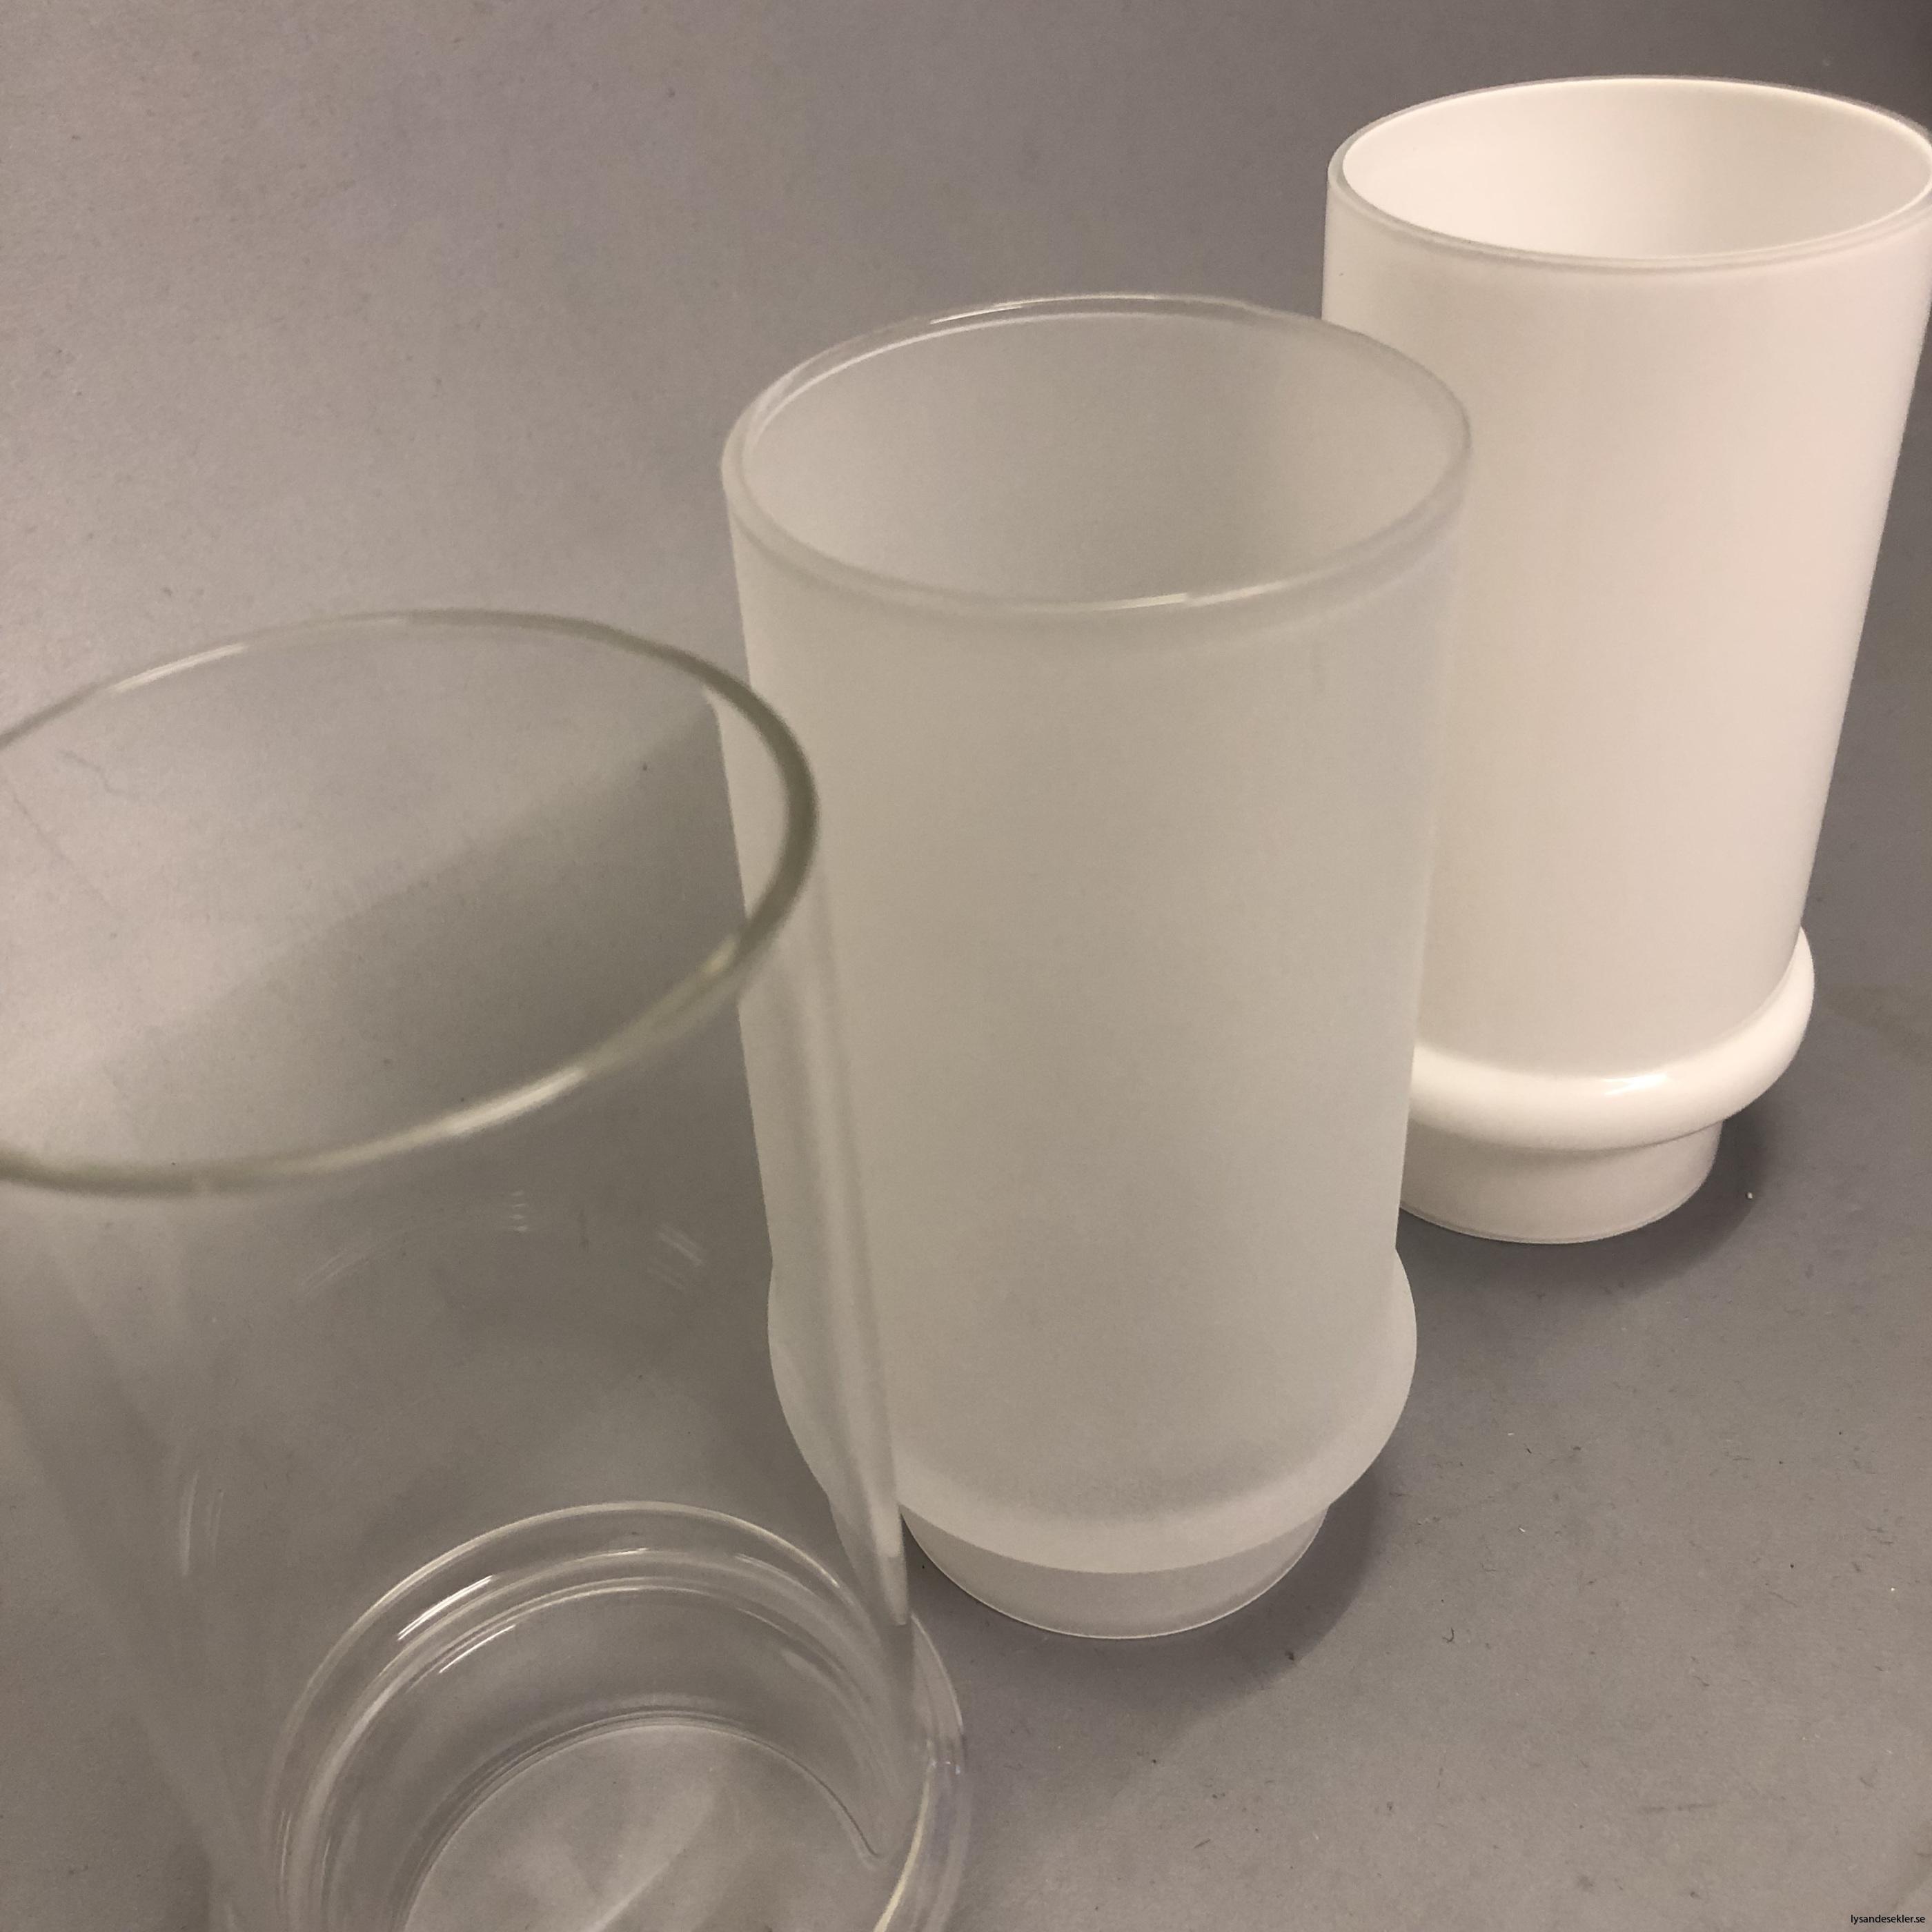 ellipse glas till oljelampa3